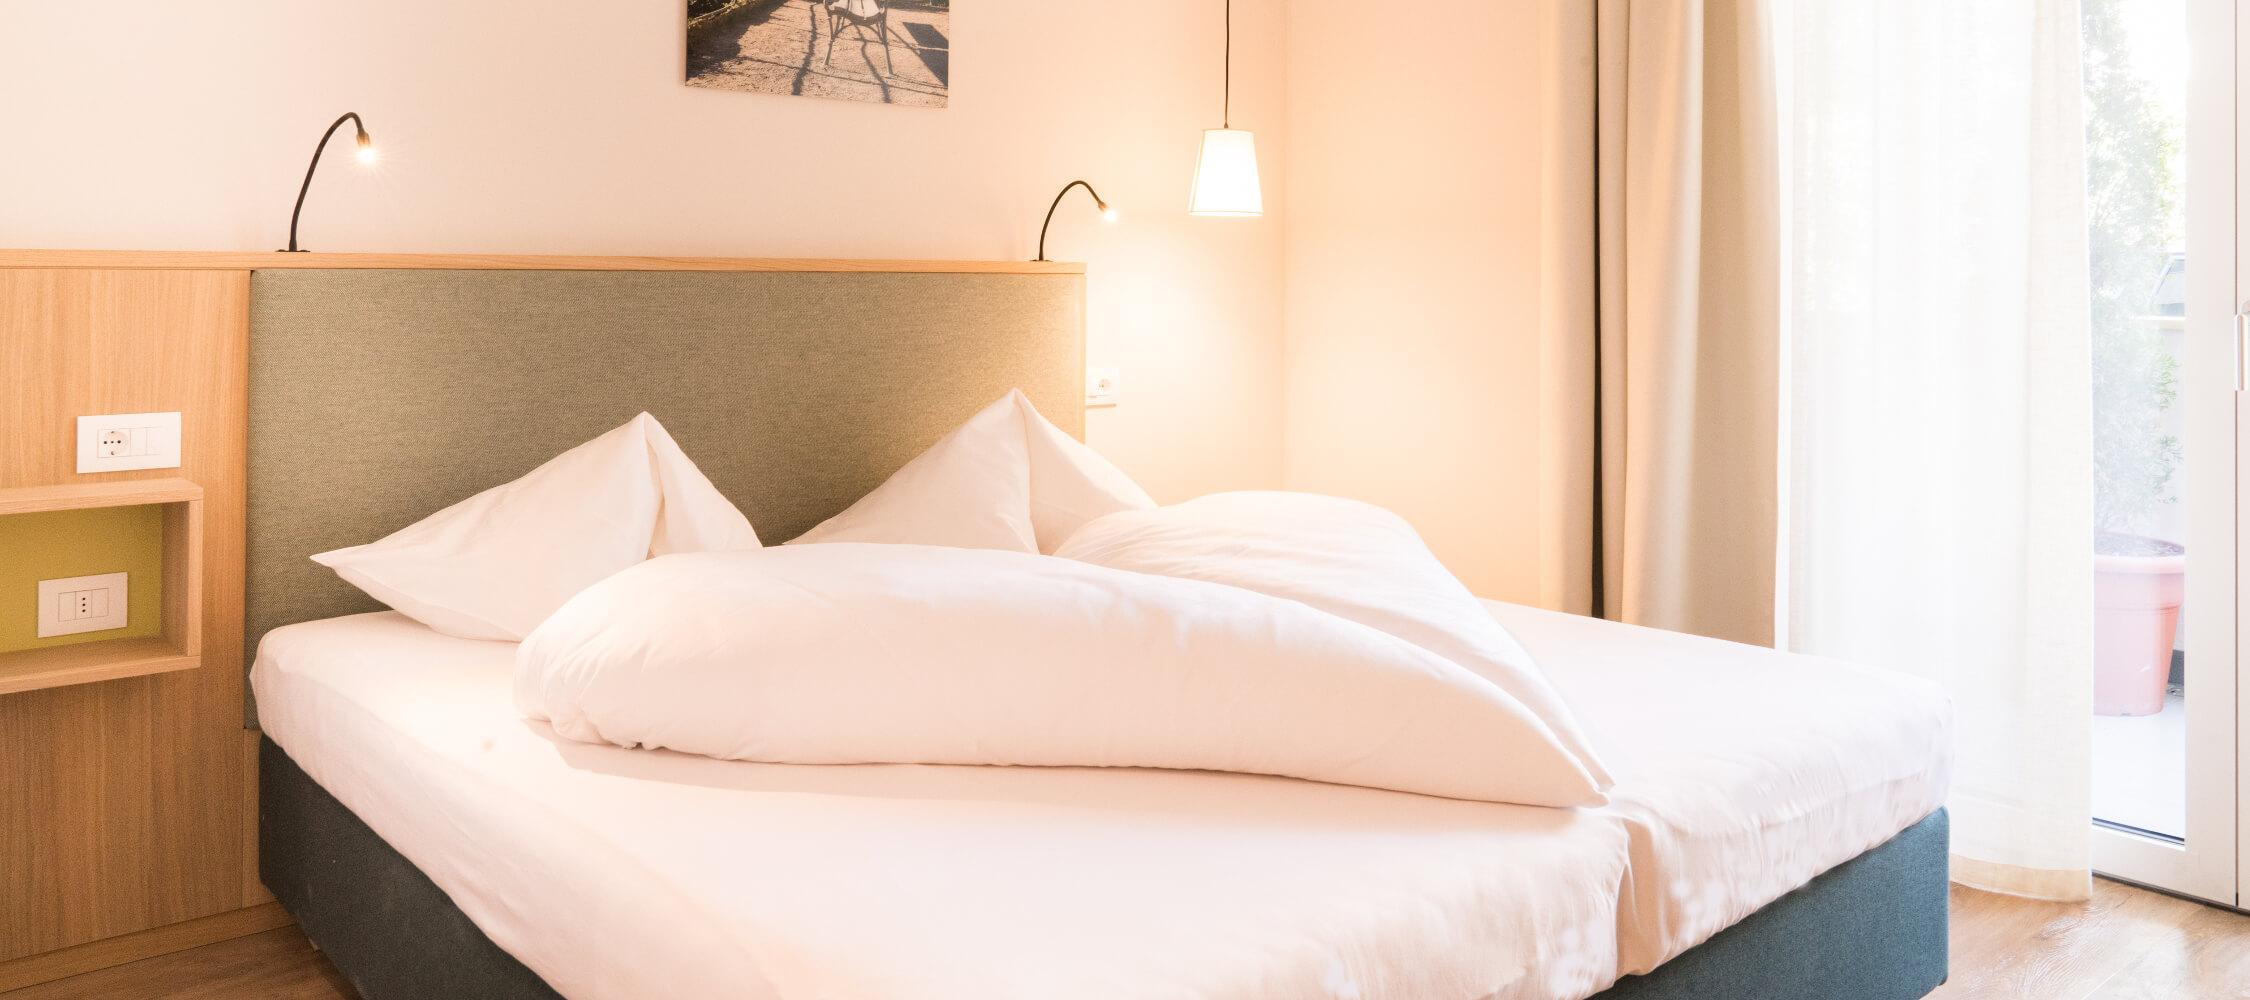 Hotel_Flora_Merano_Rooms_Komfort_Doppelzimmer_Olivia_Bett_DSC01114_BeatricePilotto_2250x1000